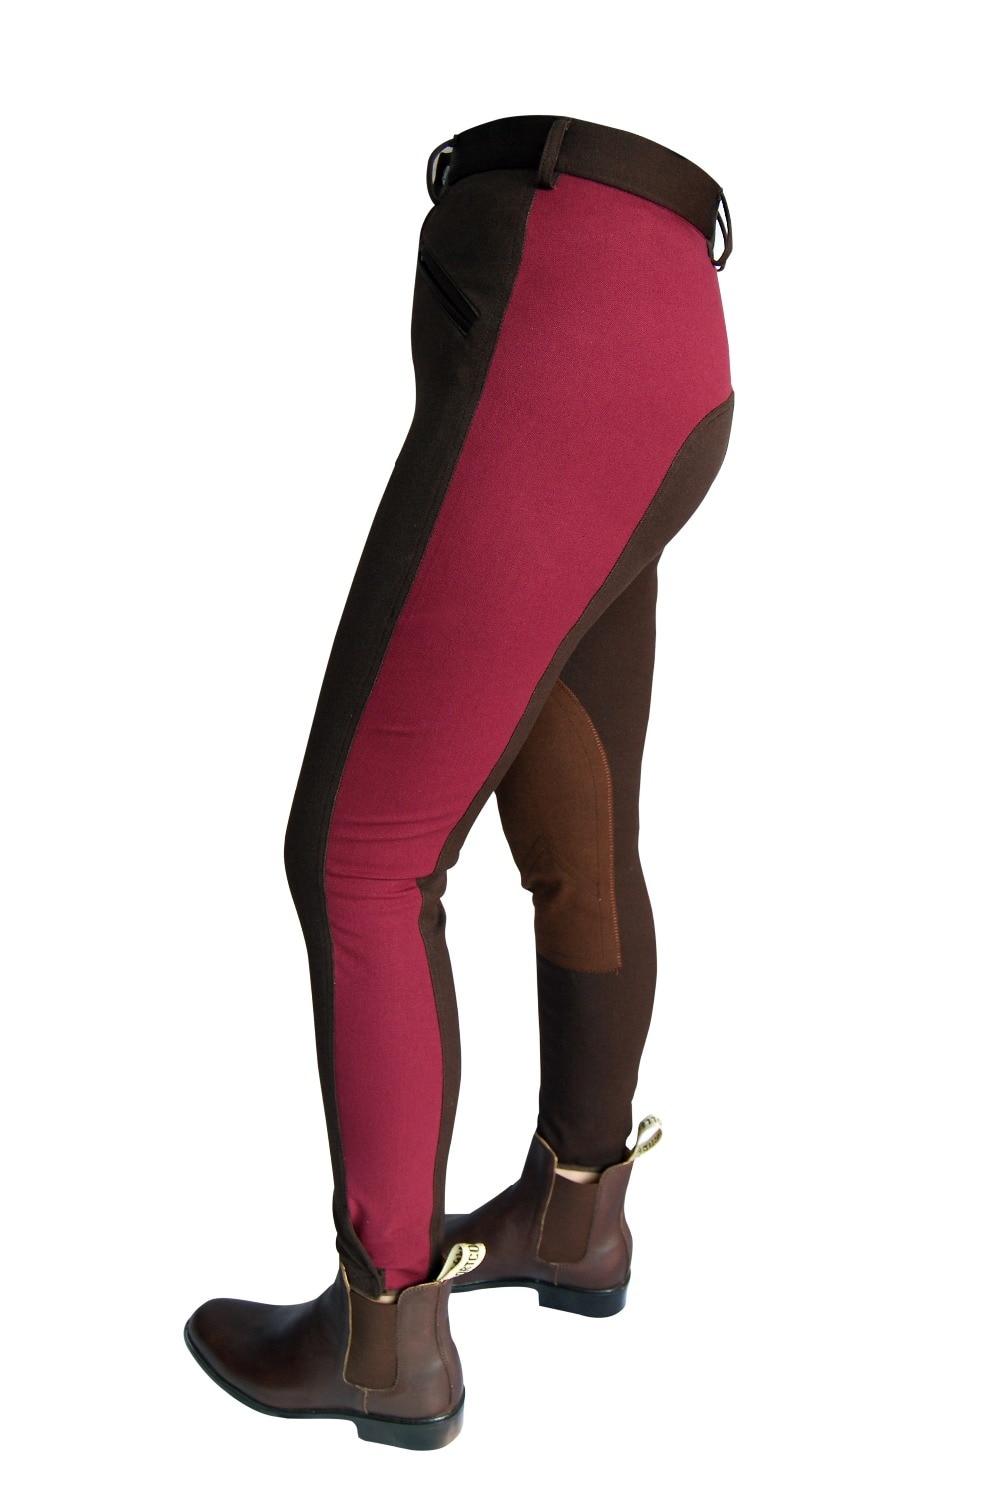 Aoud Horse Riding Pants Breeches Soft Breathable Equestrian Chaps Unisex Women Pants Unisex Halters Saddle Boots Paardensport